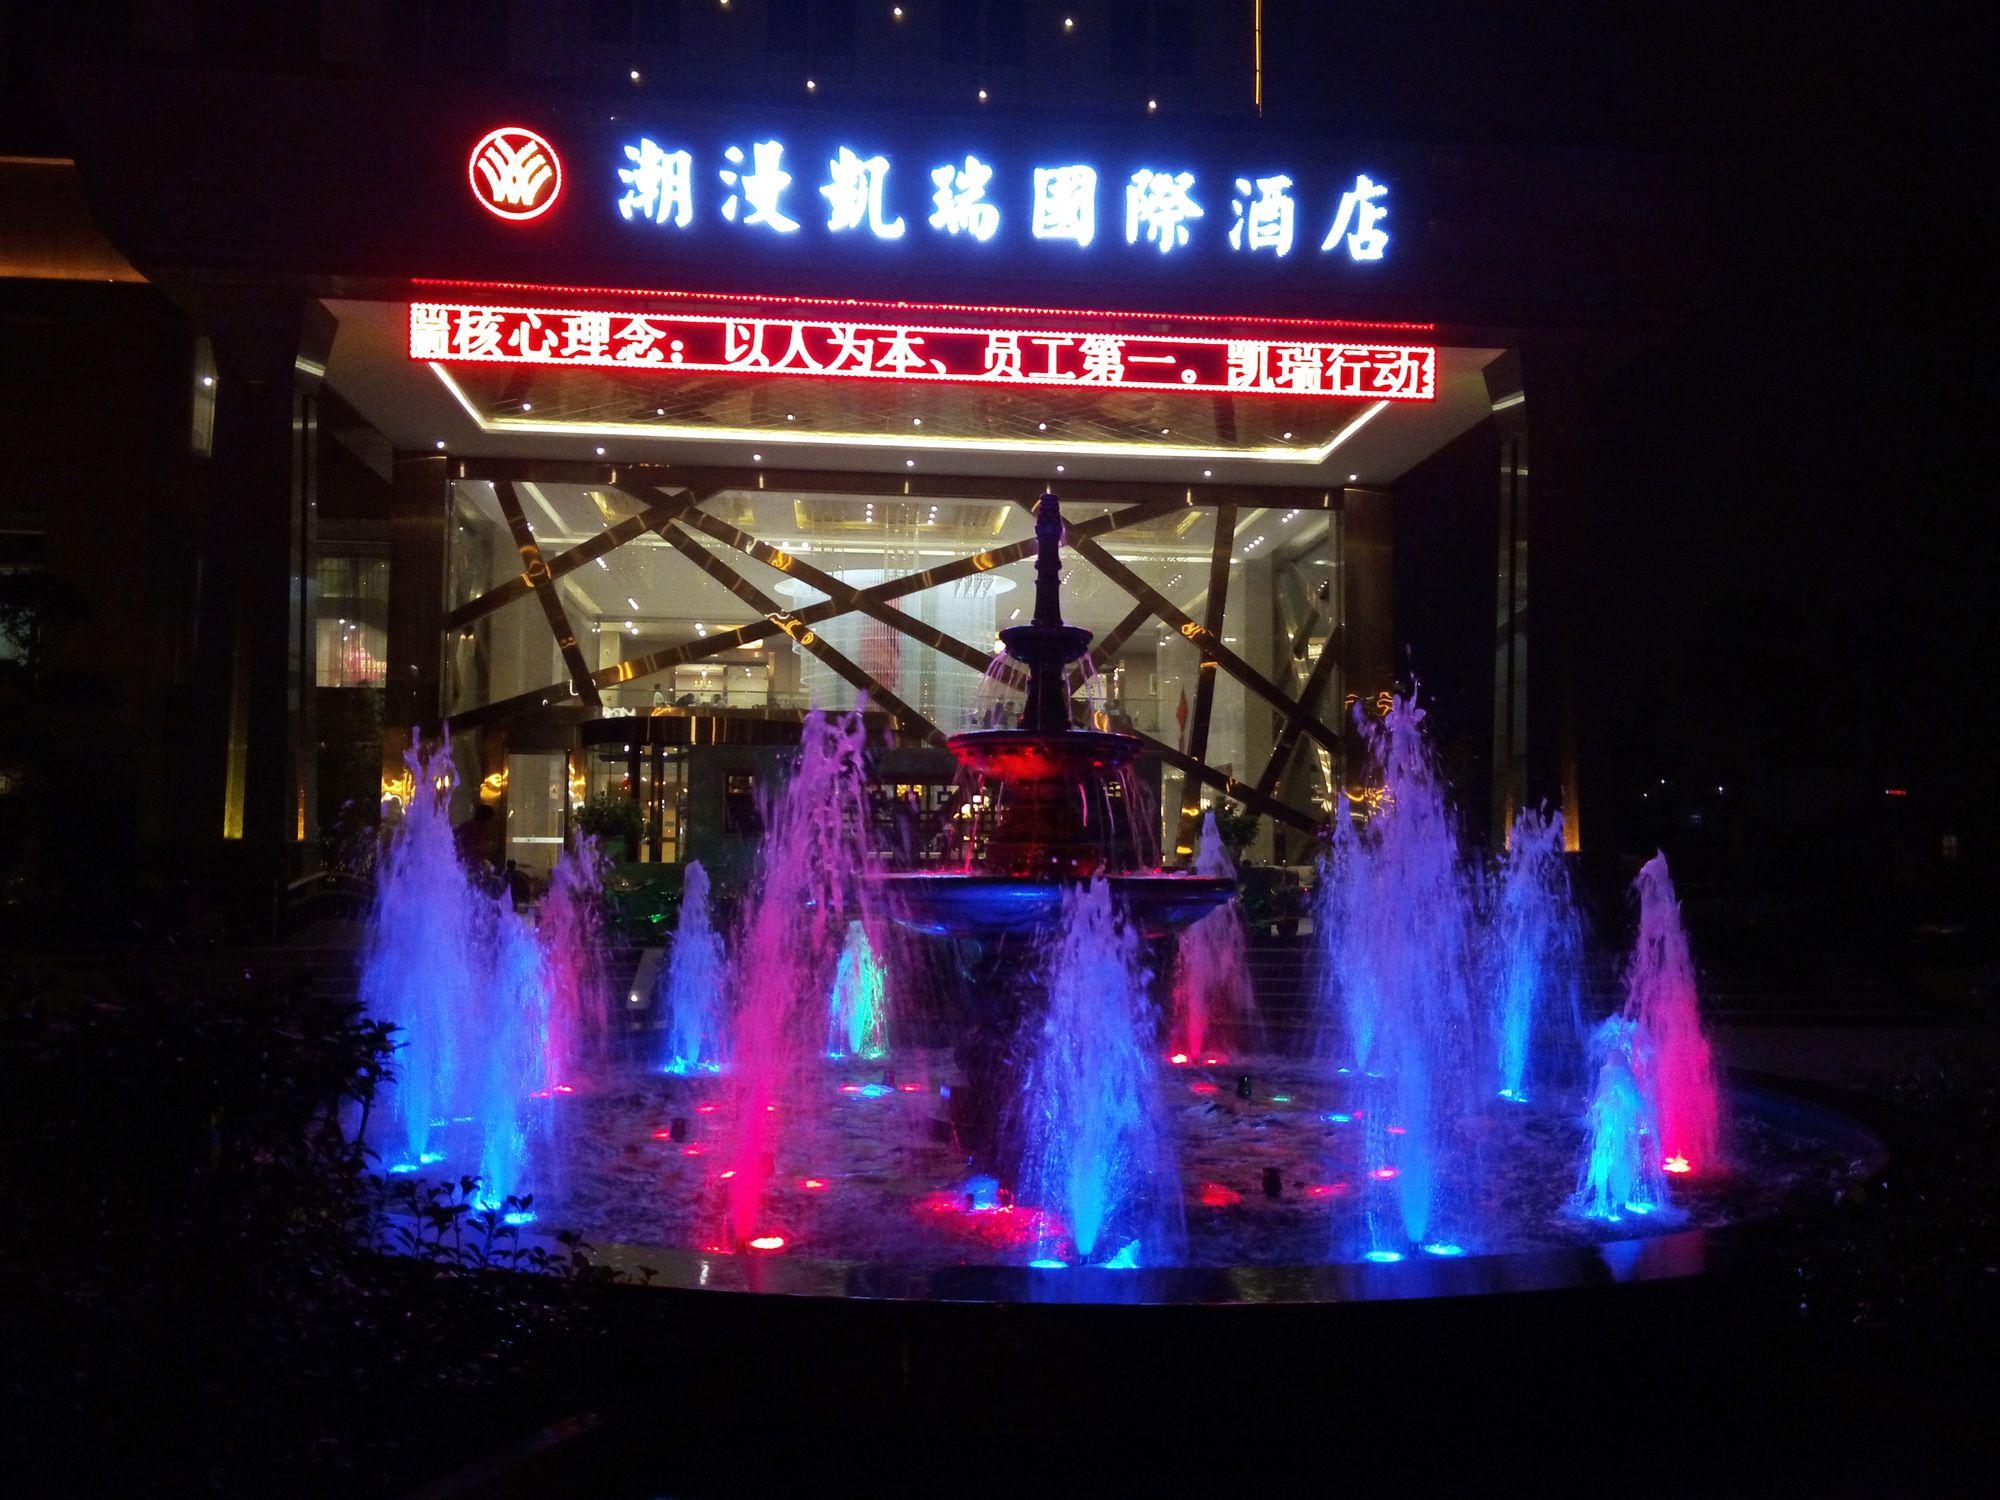 Wuhan Chaoman Hotel Optic Valley